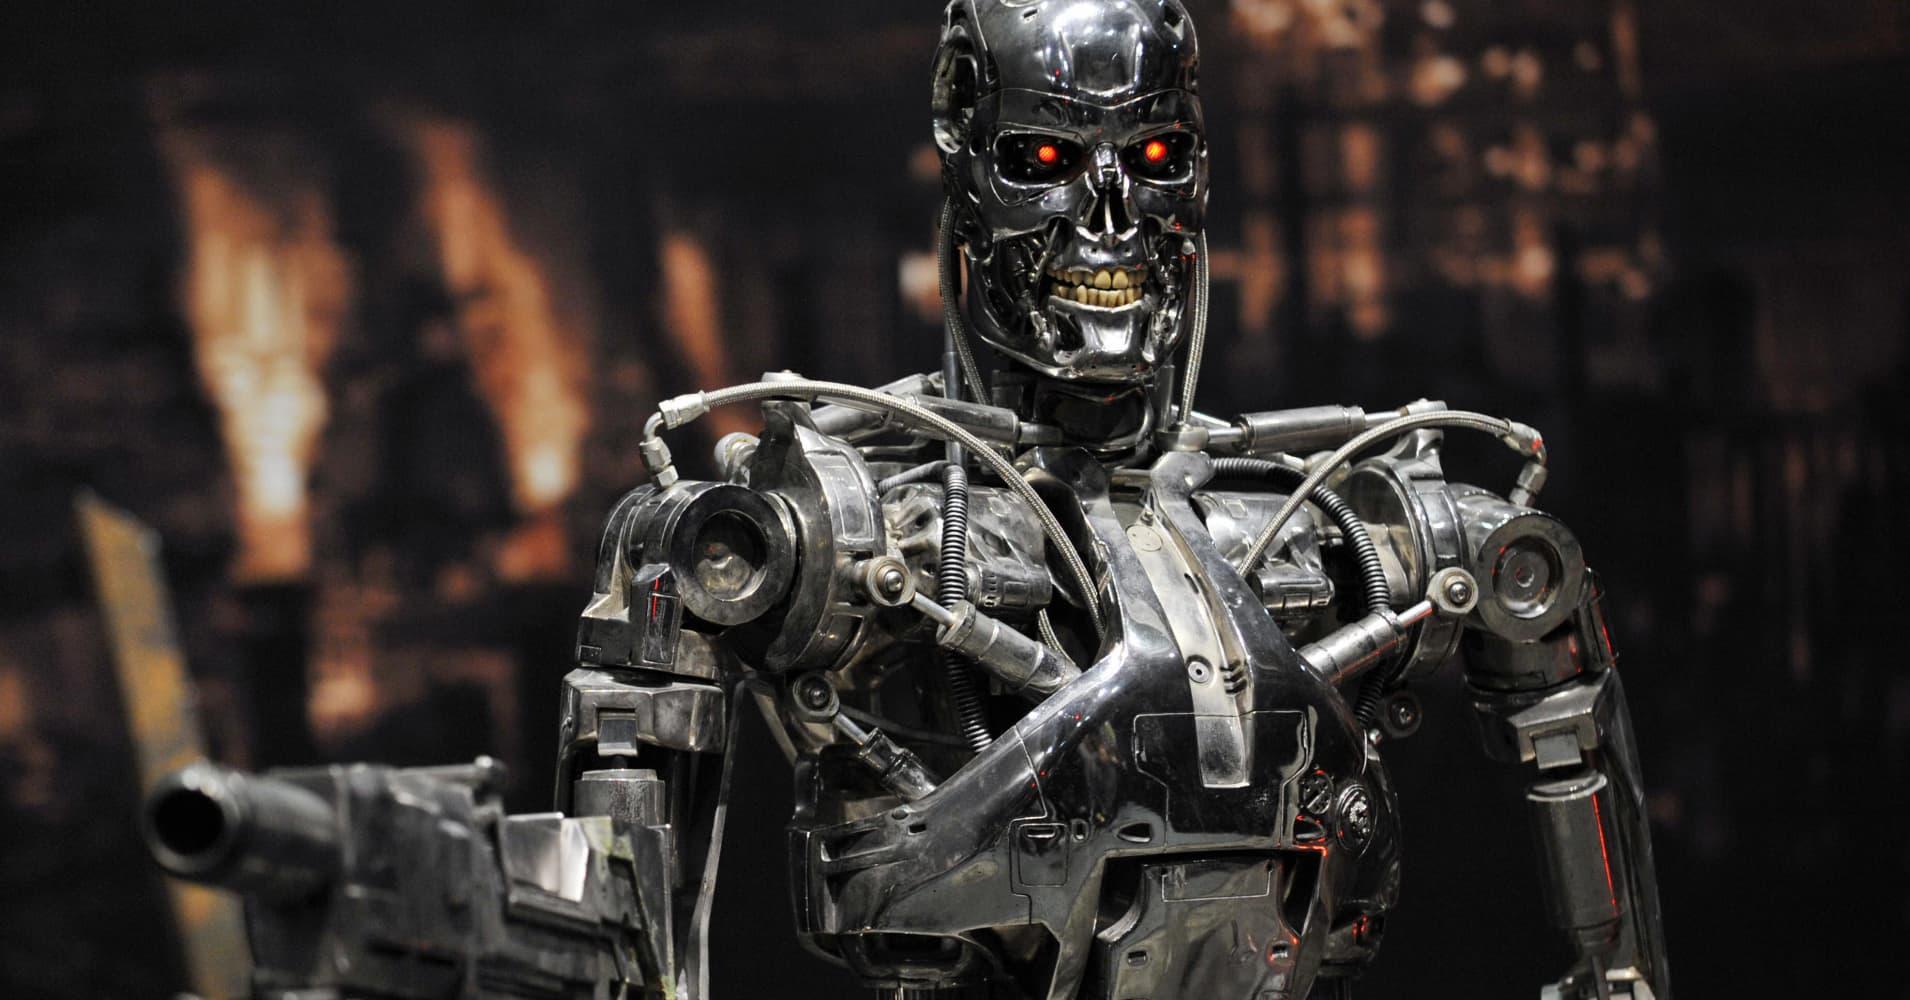 Elon Musk joins more than 100 tech bosses calling for ban on killer robots